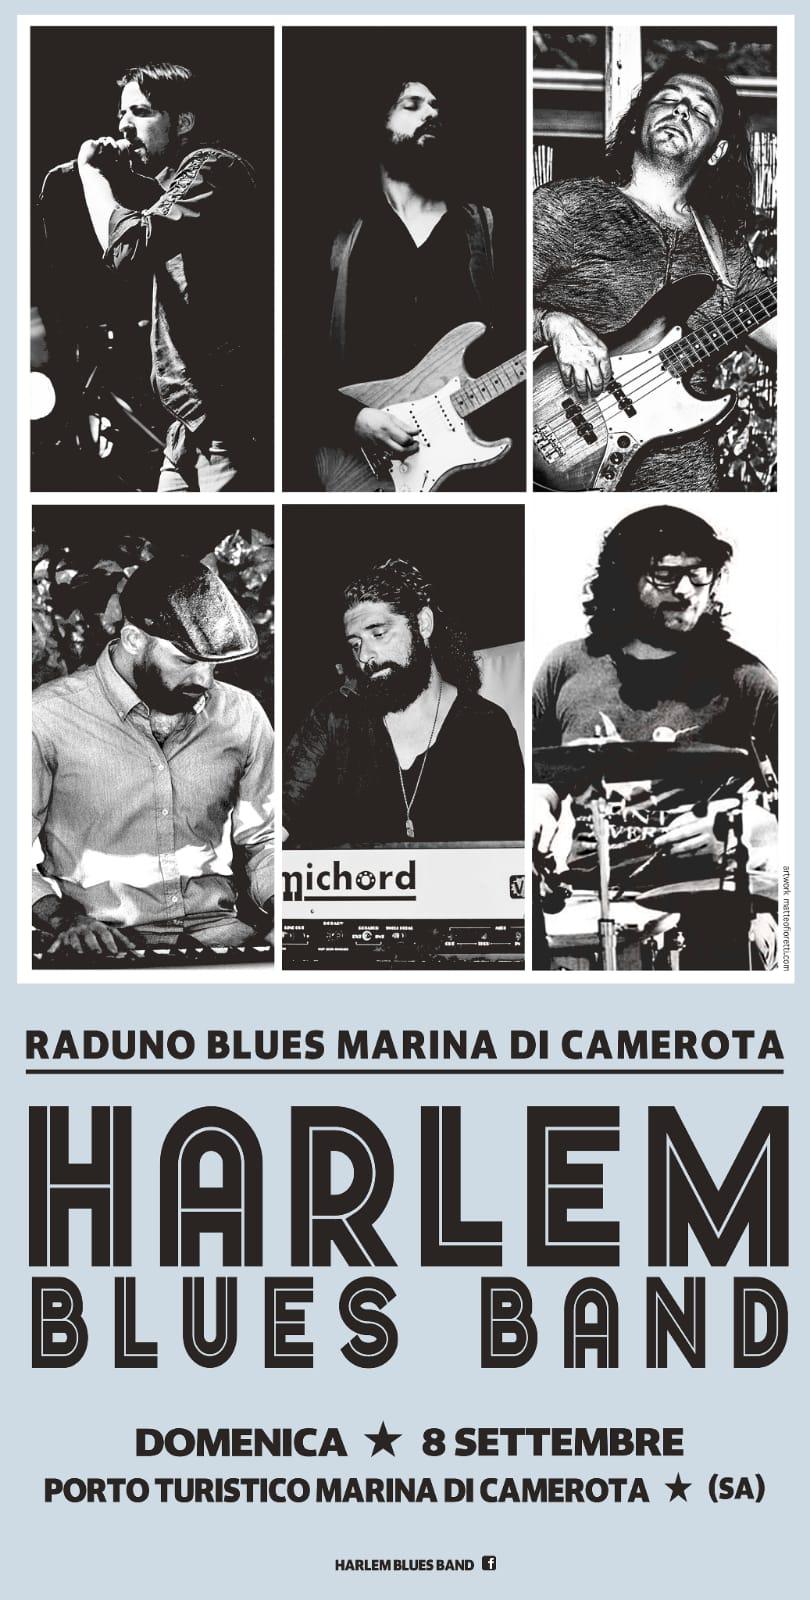 Raduno Blues Marina di Camerota